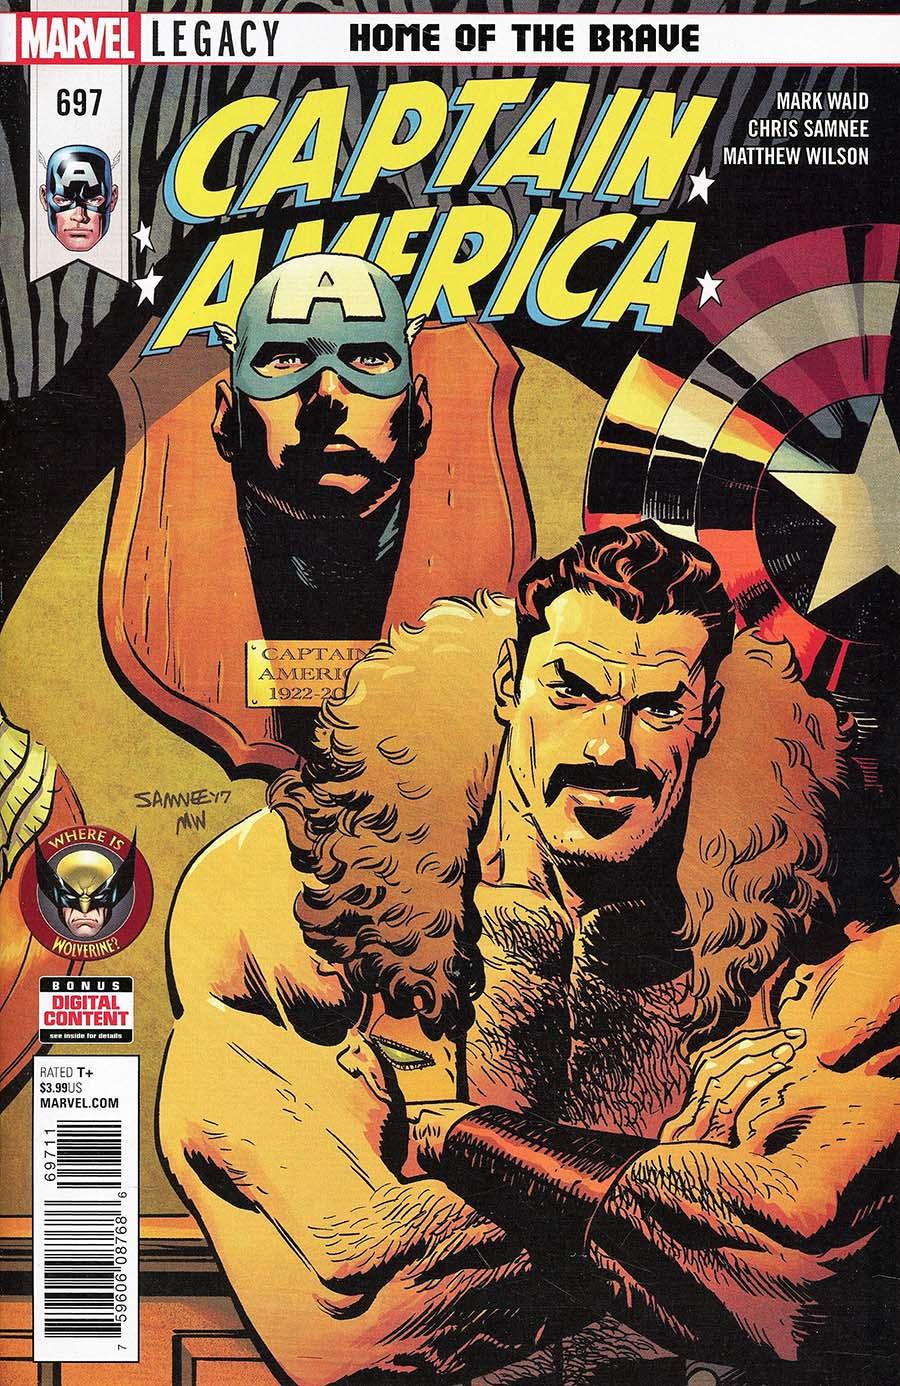 Captain America Vol 8 #697 Cover A 1st Ptg Regular Chris Samnee Cover (Marvel Legacy Tie-In)